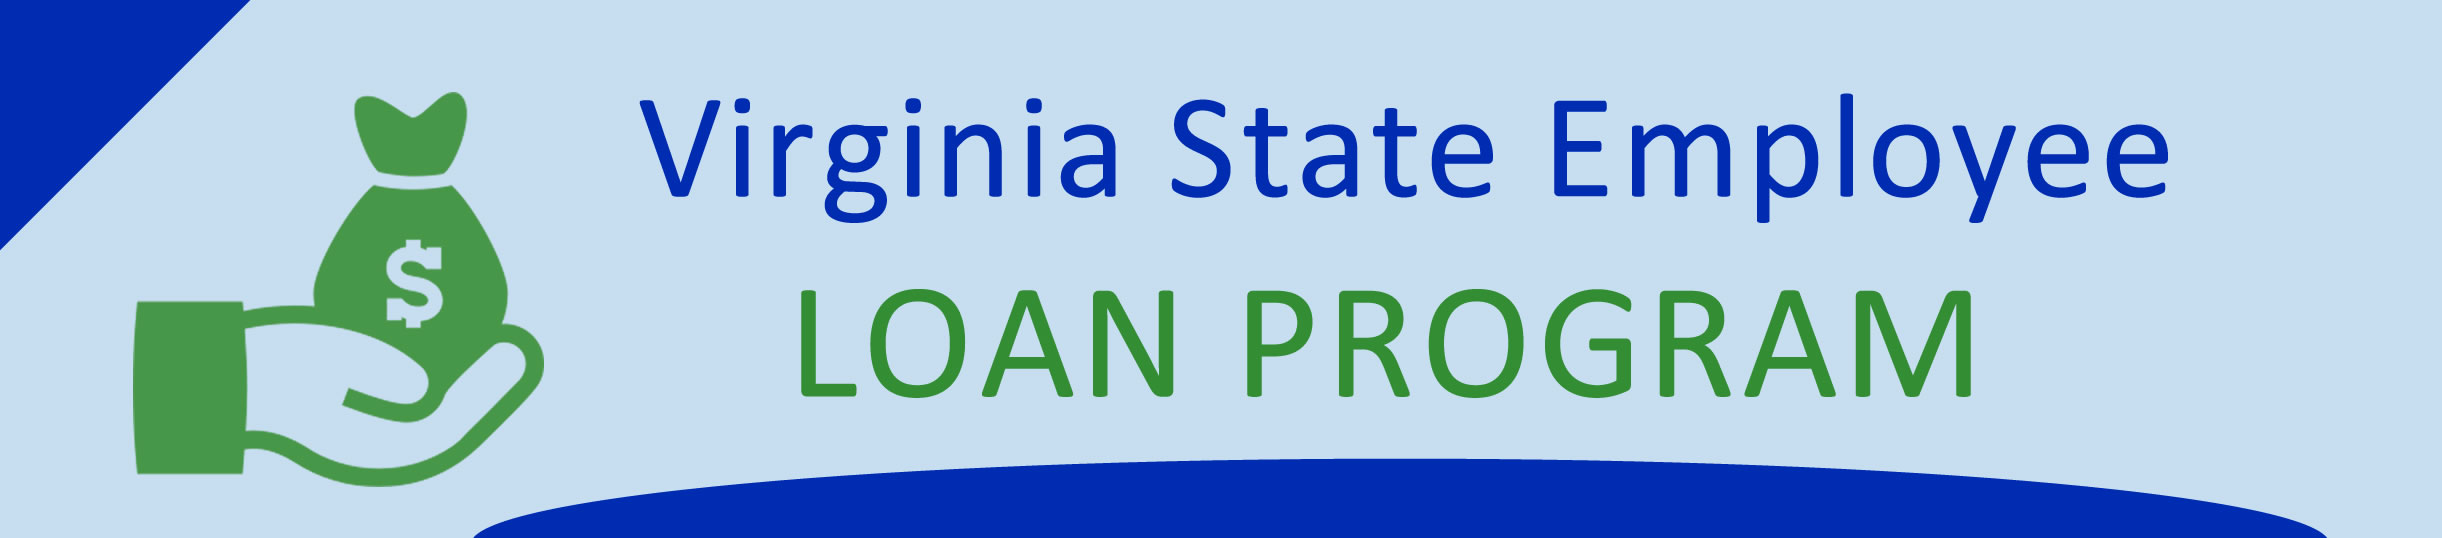 Virginia State Employee Loan Program